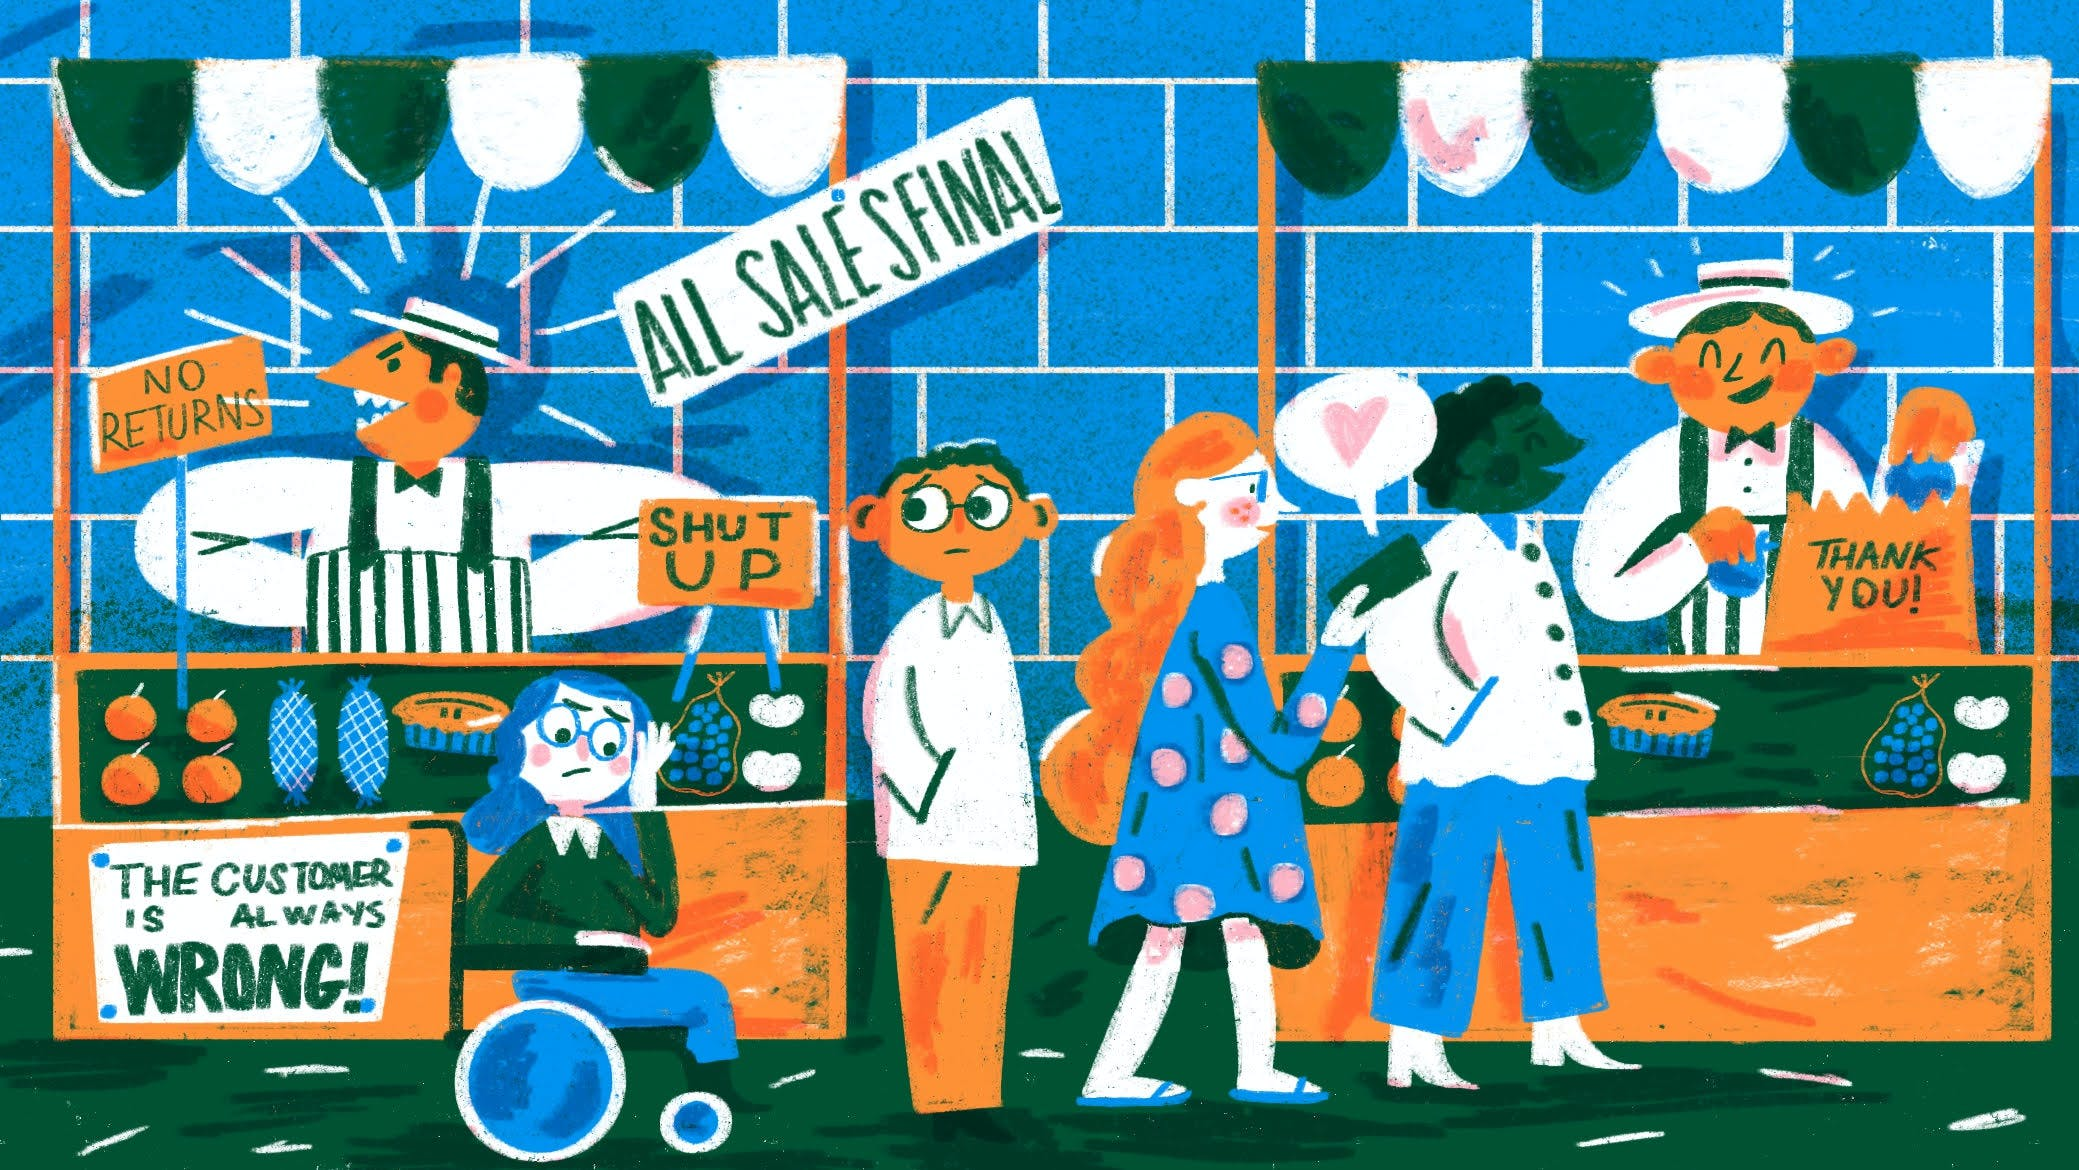 Illustration by Sonny Ross